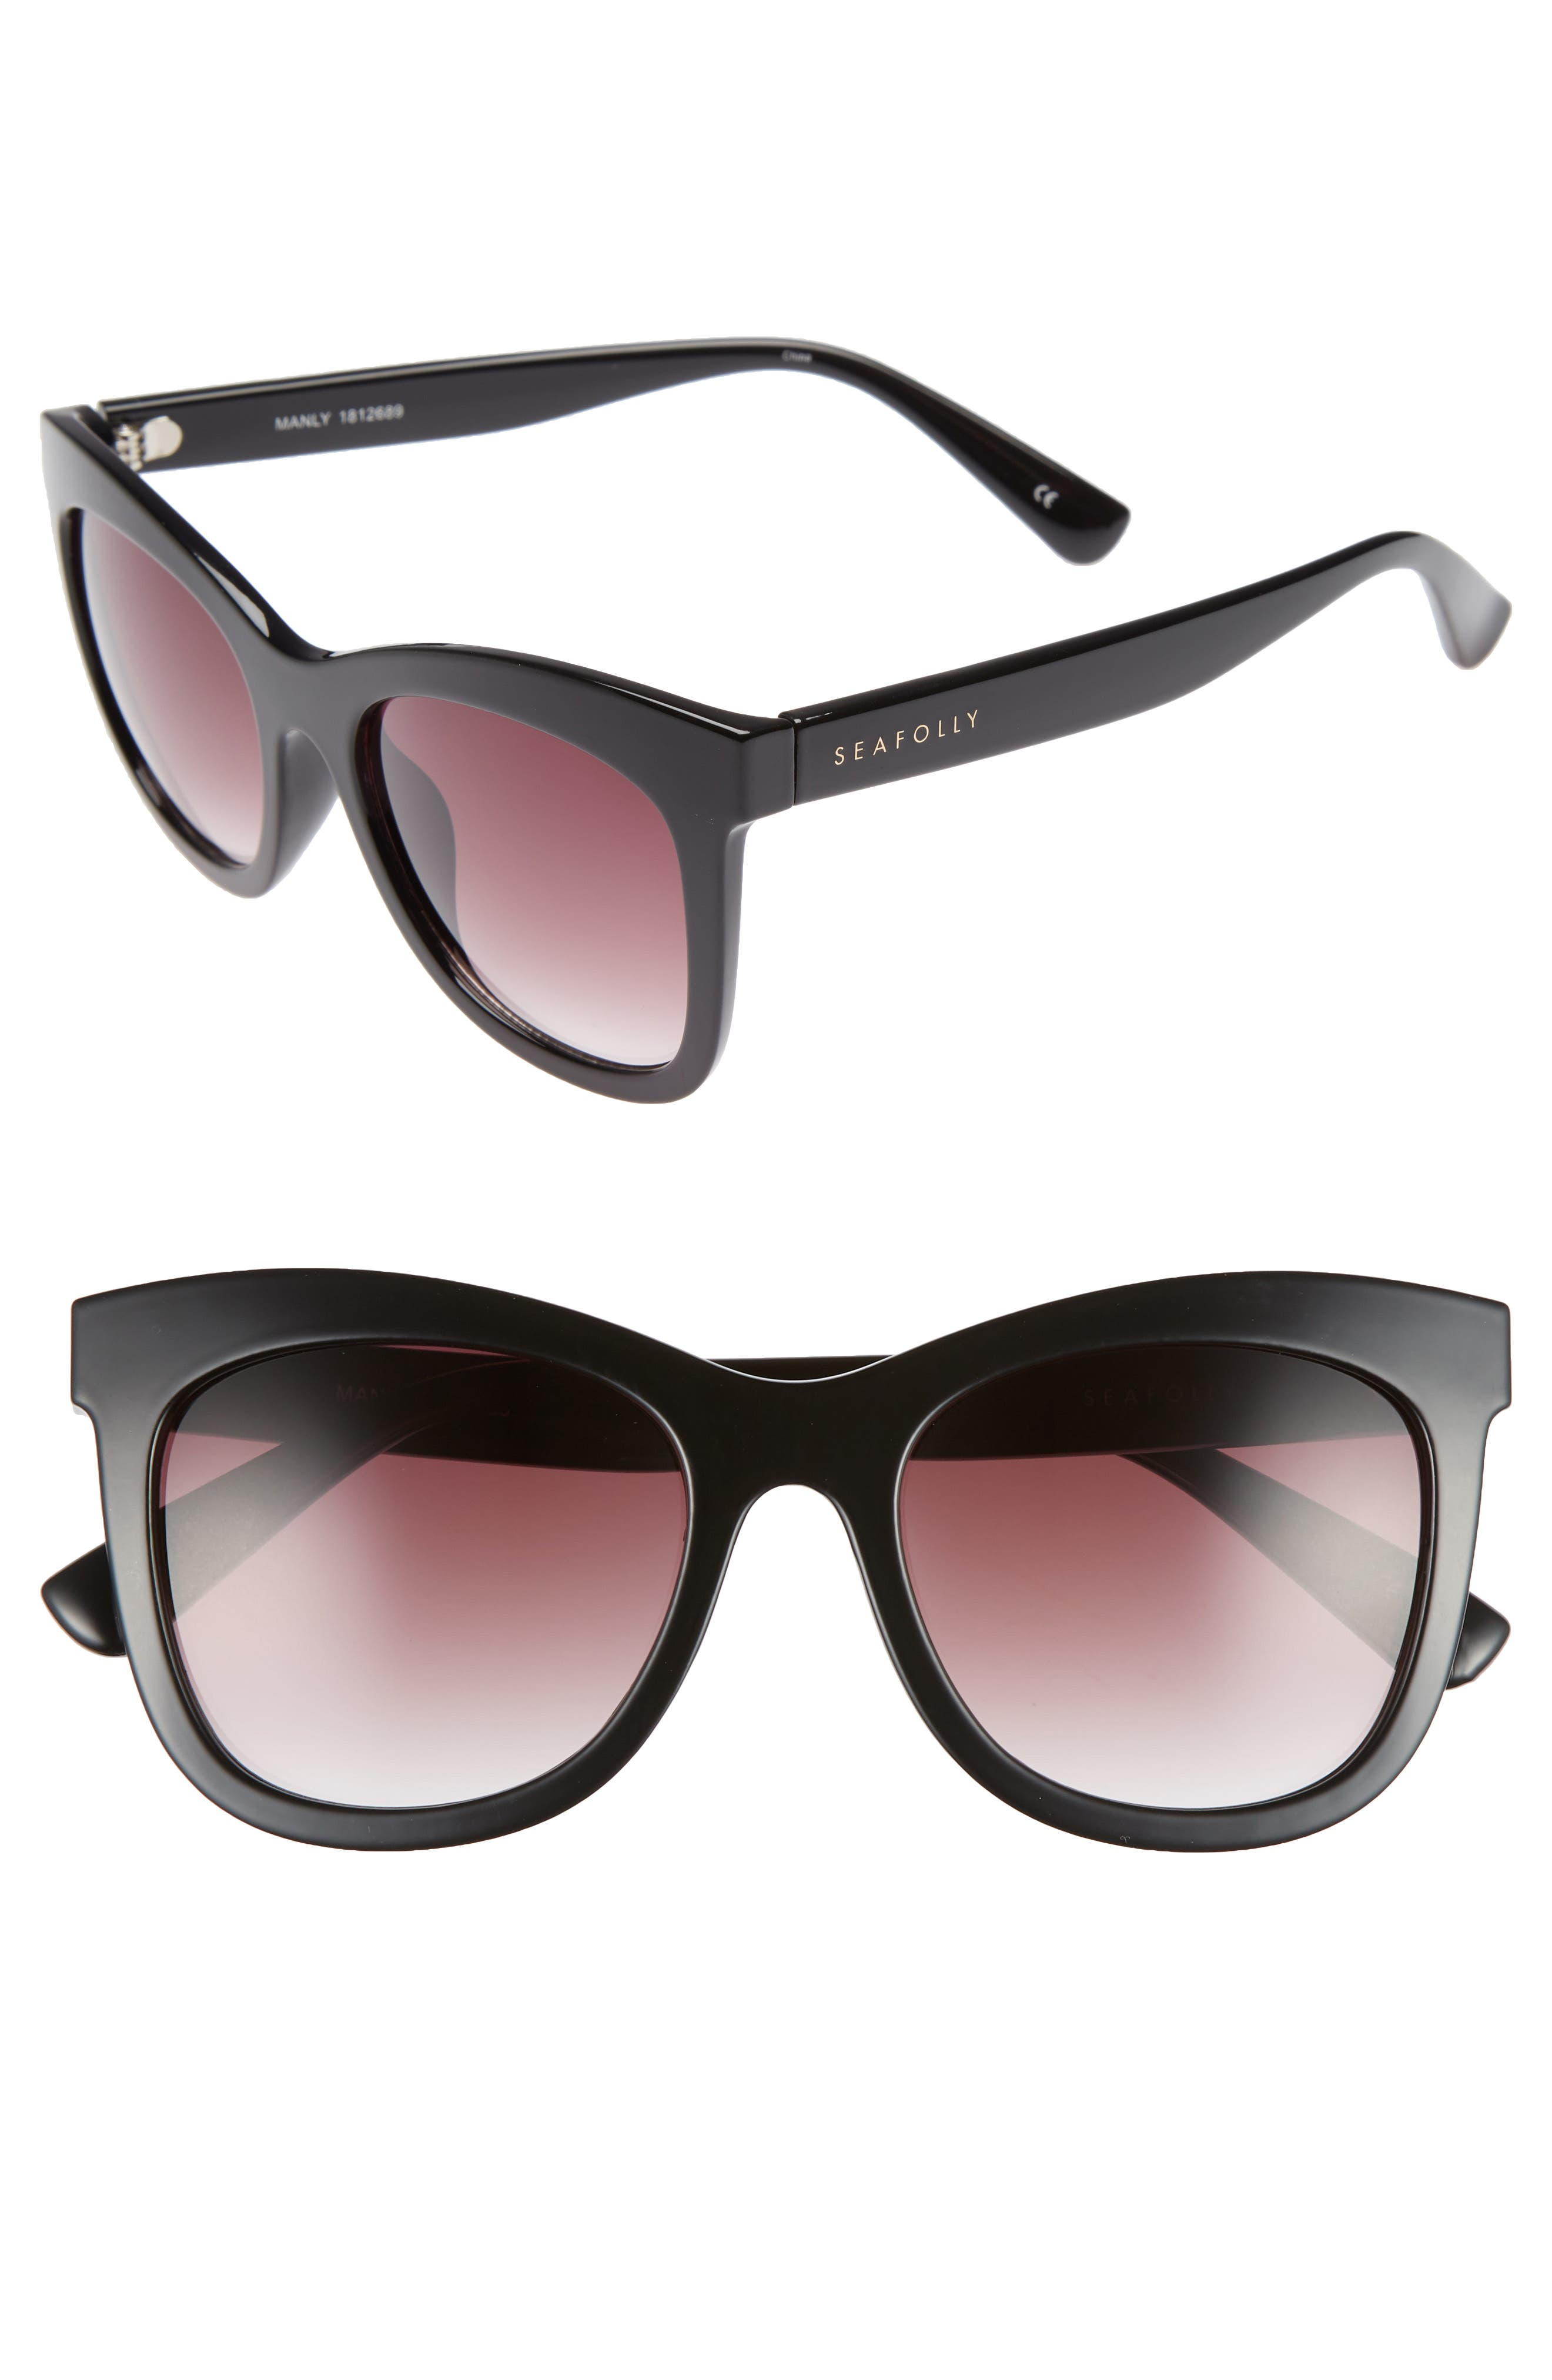 Manly 52mm Cat Eye Sunglasses,                             Main thumbnail 1, color,                             BLACK